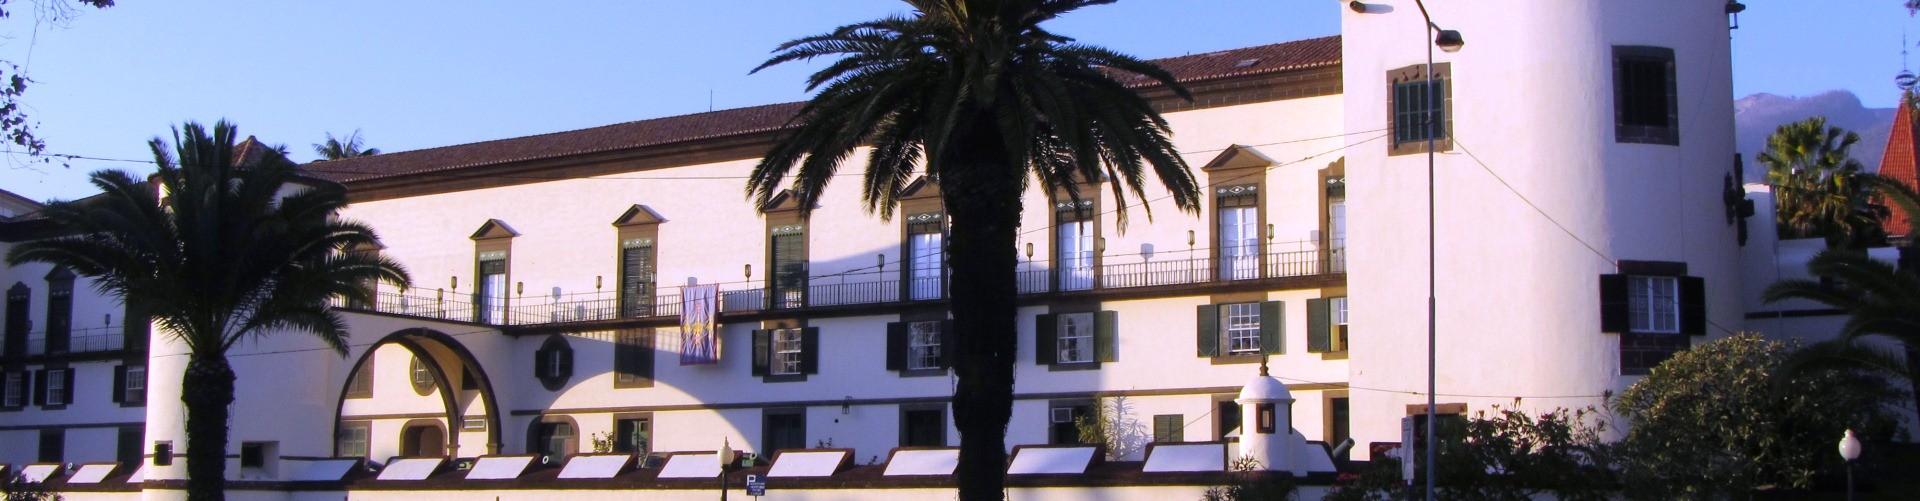 São Lourenço Palace in Funchal, Madeira Island